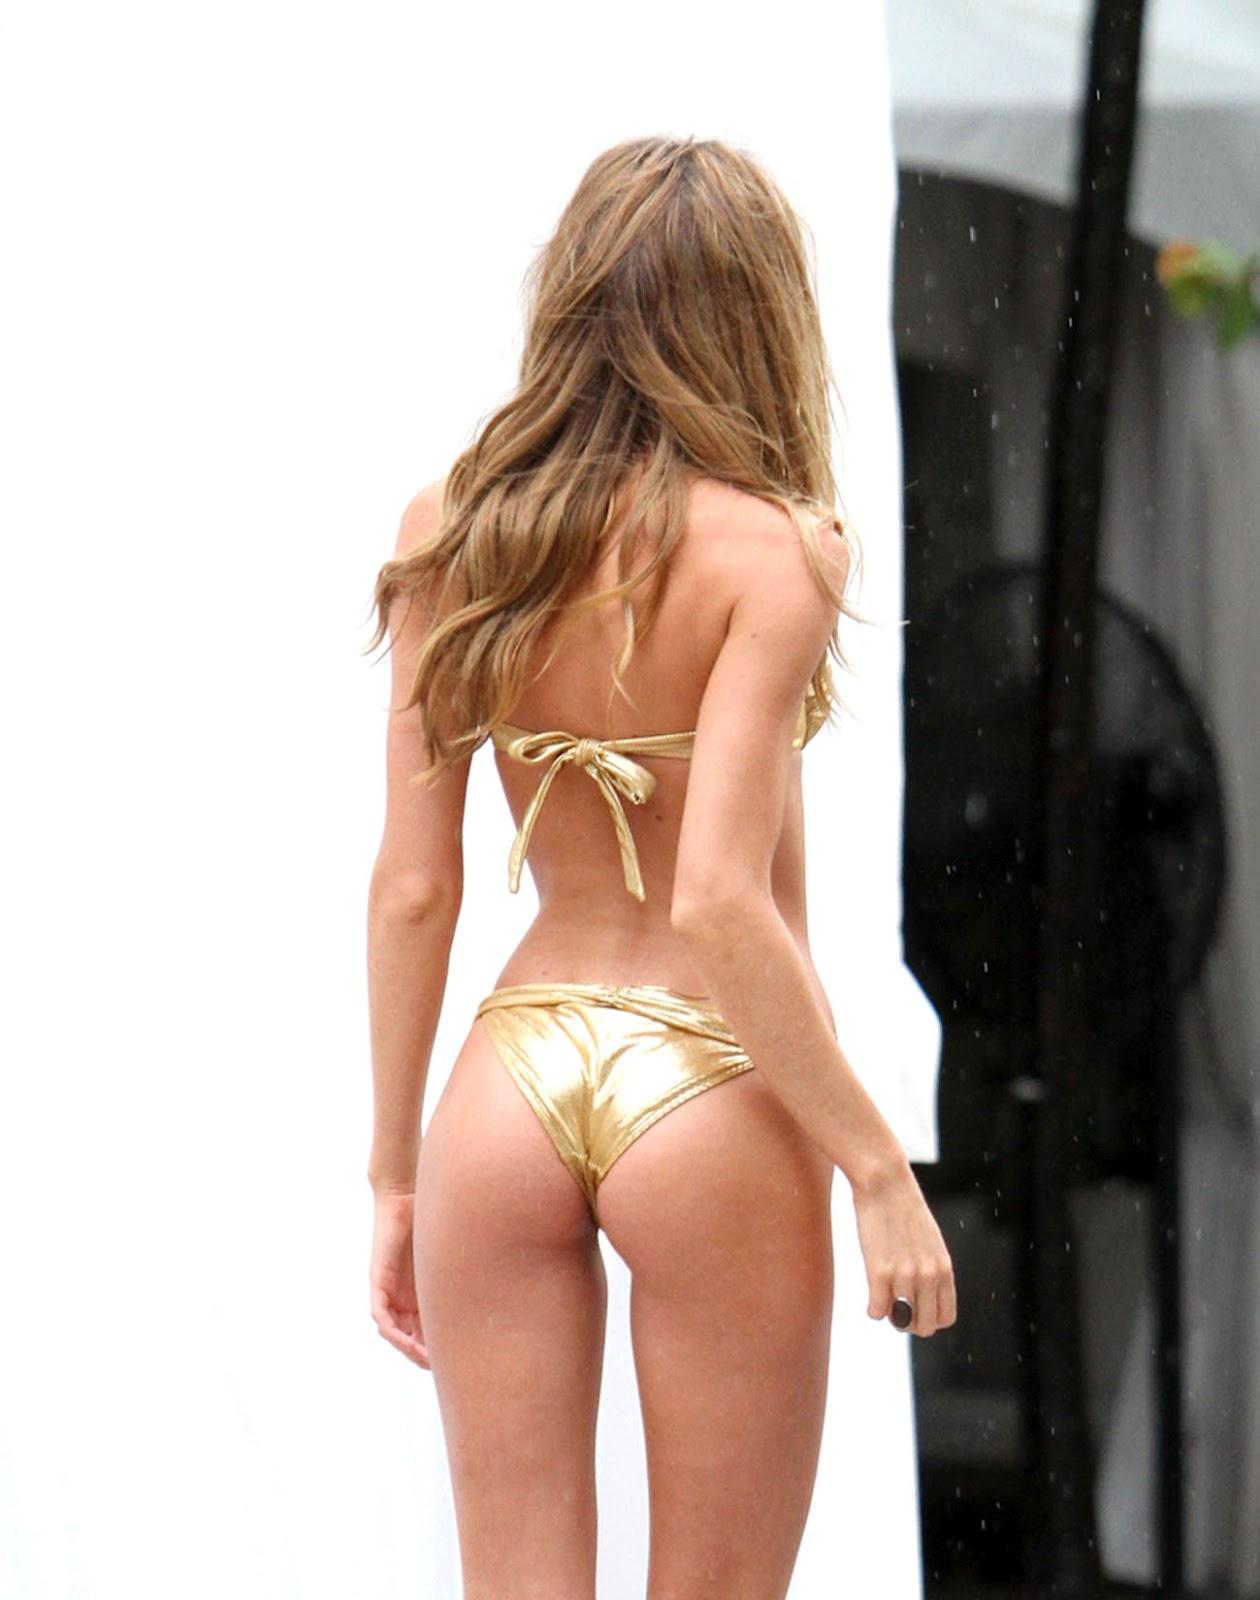 candice swanepoel gold bikini